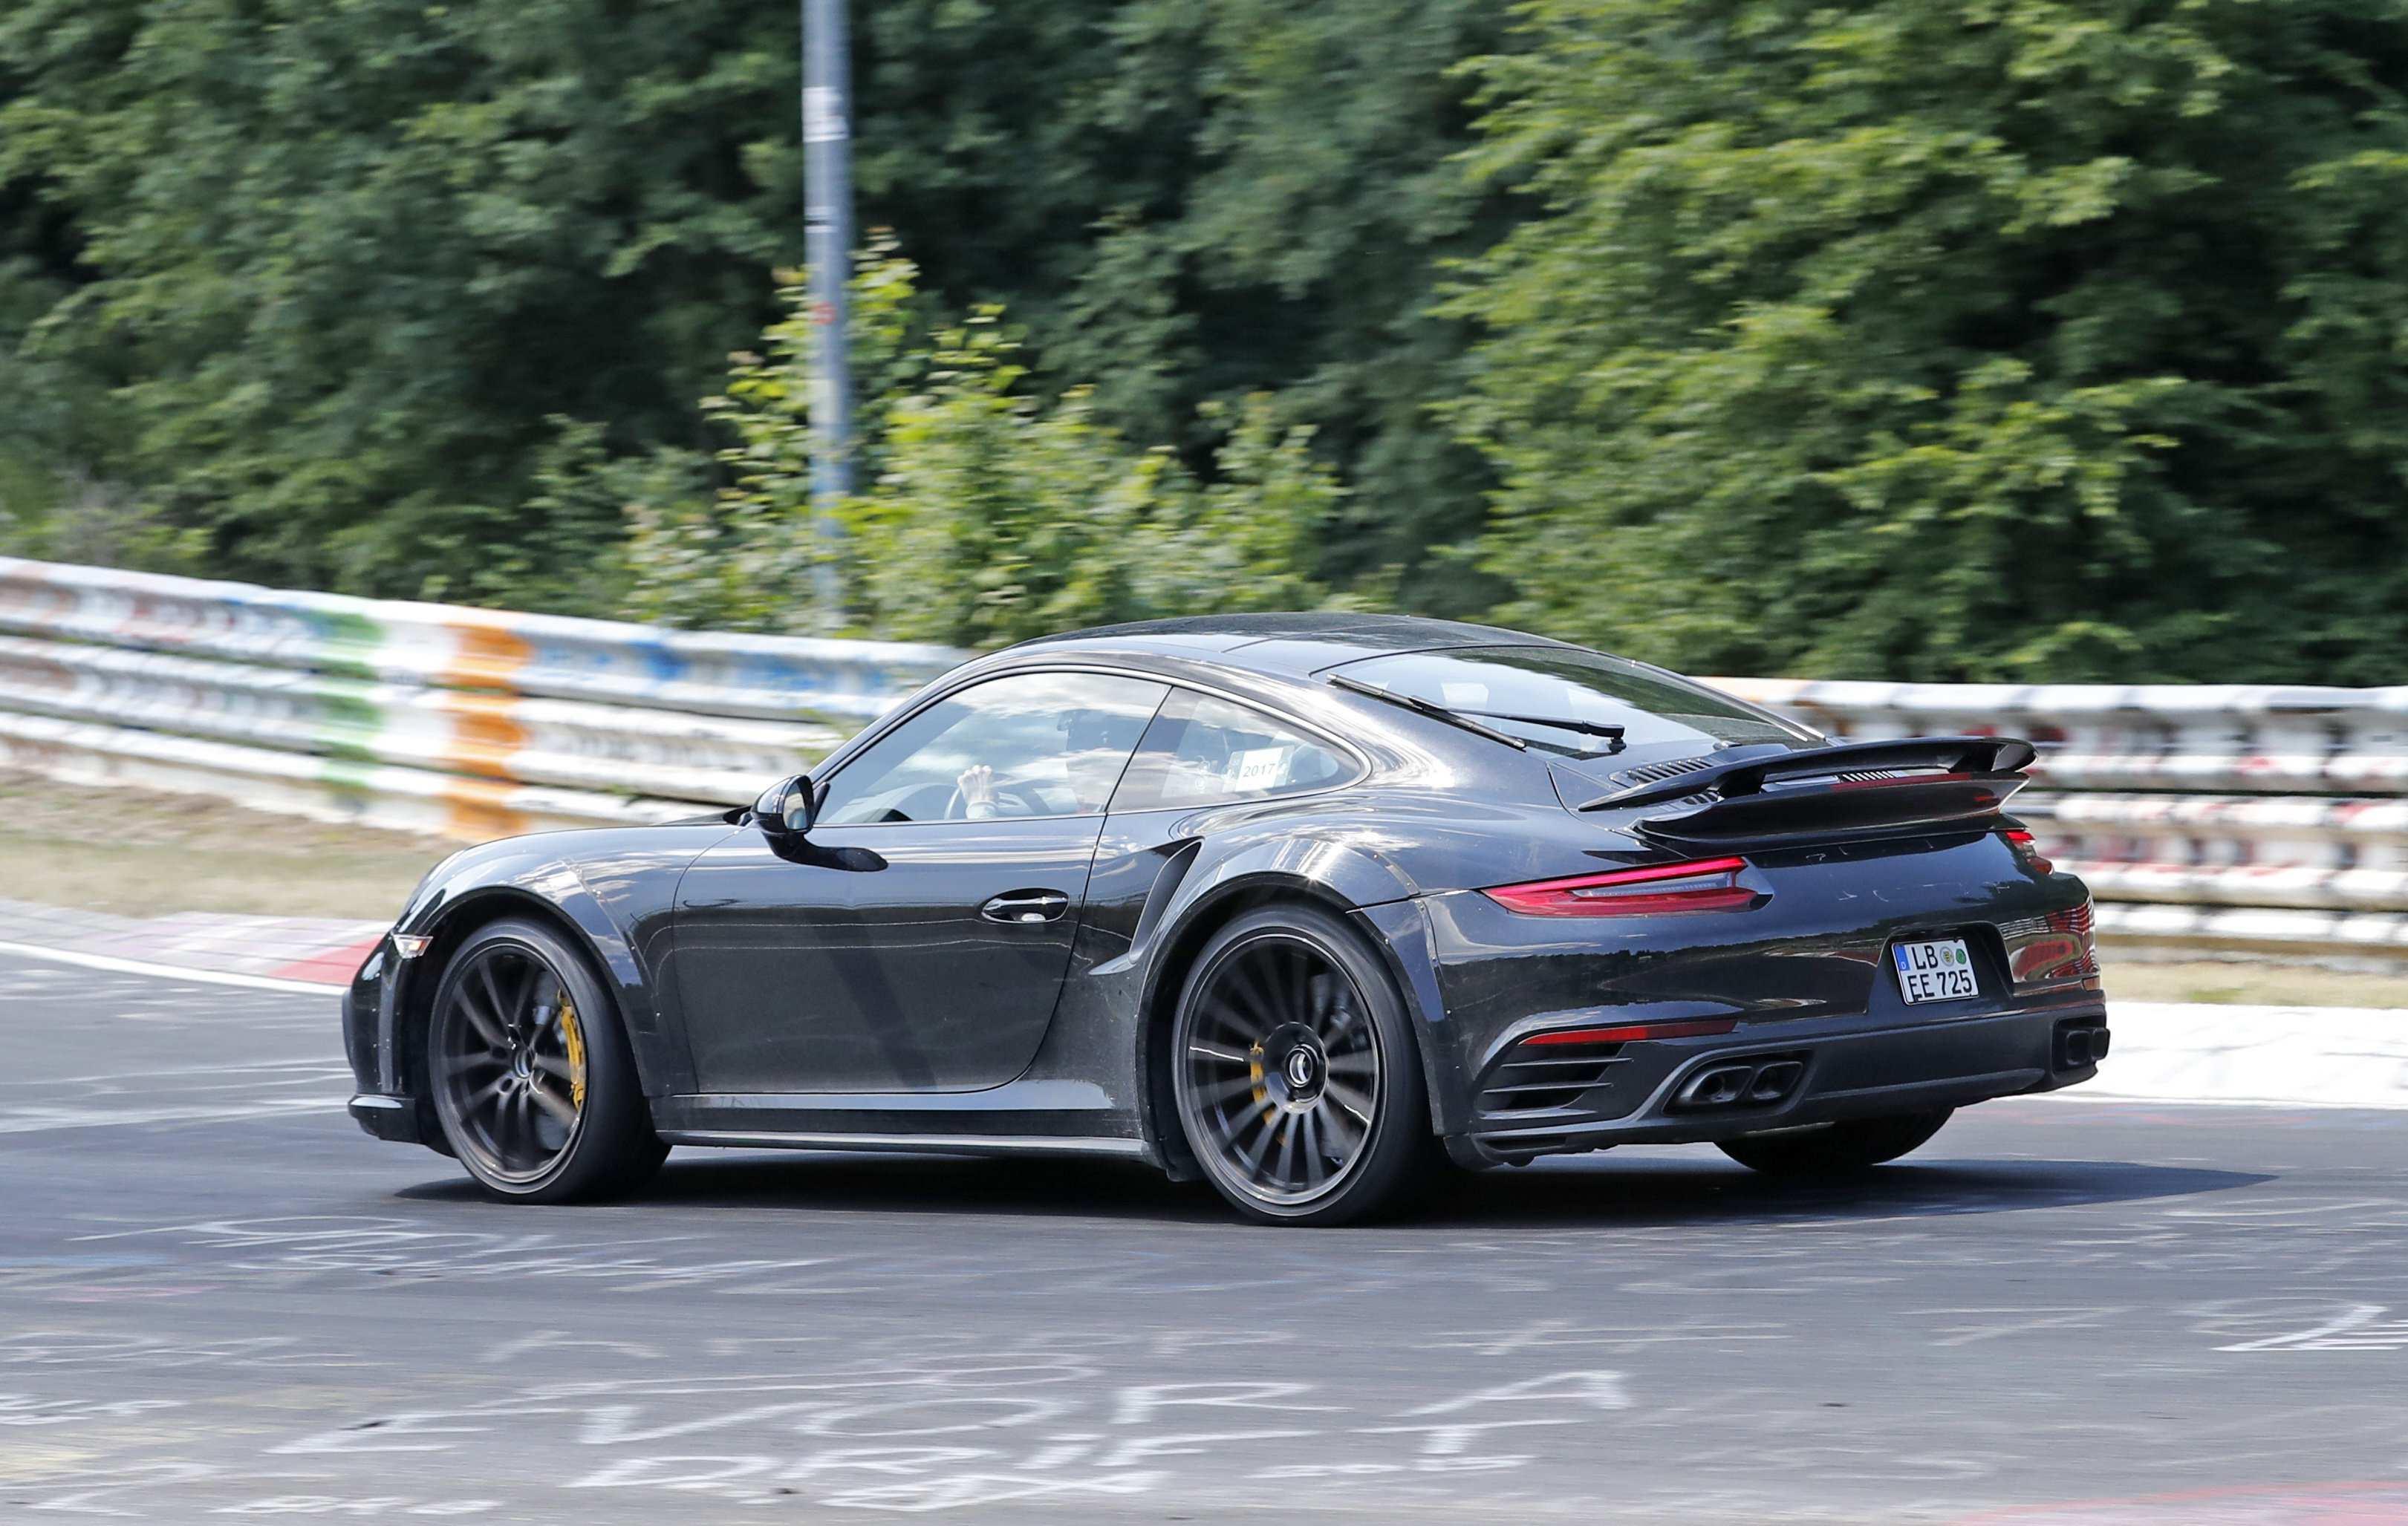 45 Gallery of 2020 Porsche Turbo S Picture by 2020 Porsche Turbo S